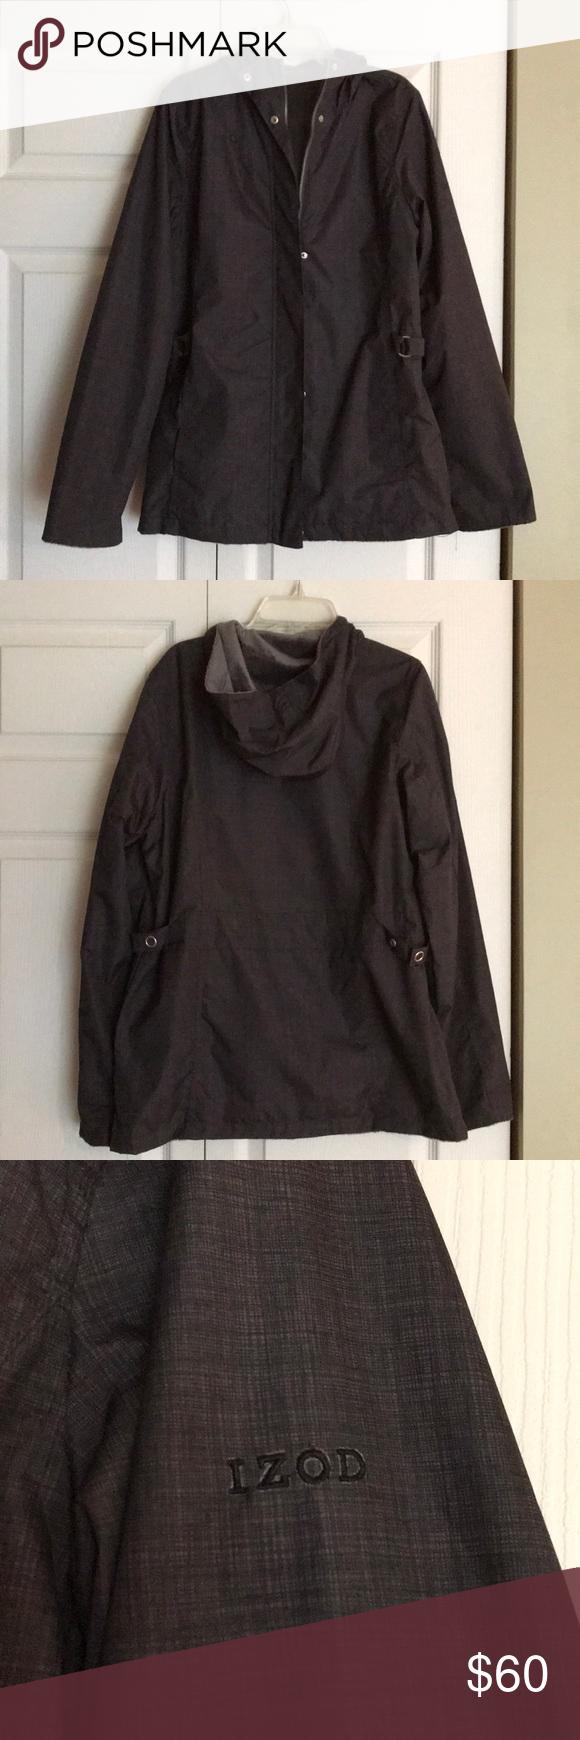 Izod Perform Women S Reversible Coat Size S P Reversible Coat Clothes Design Women [ 1740 x 580 Pixel ]